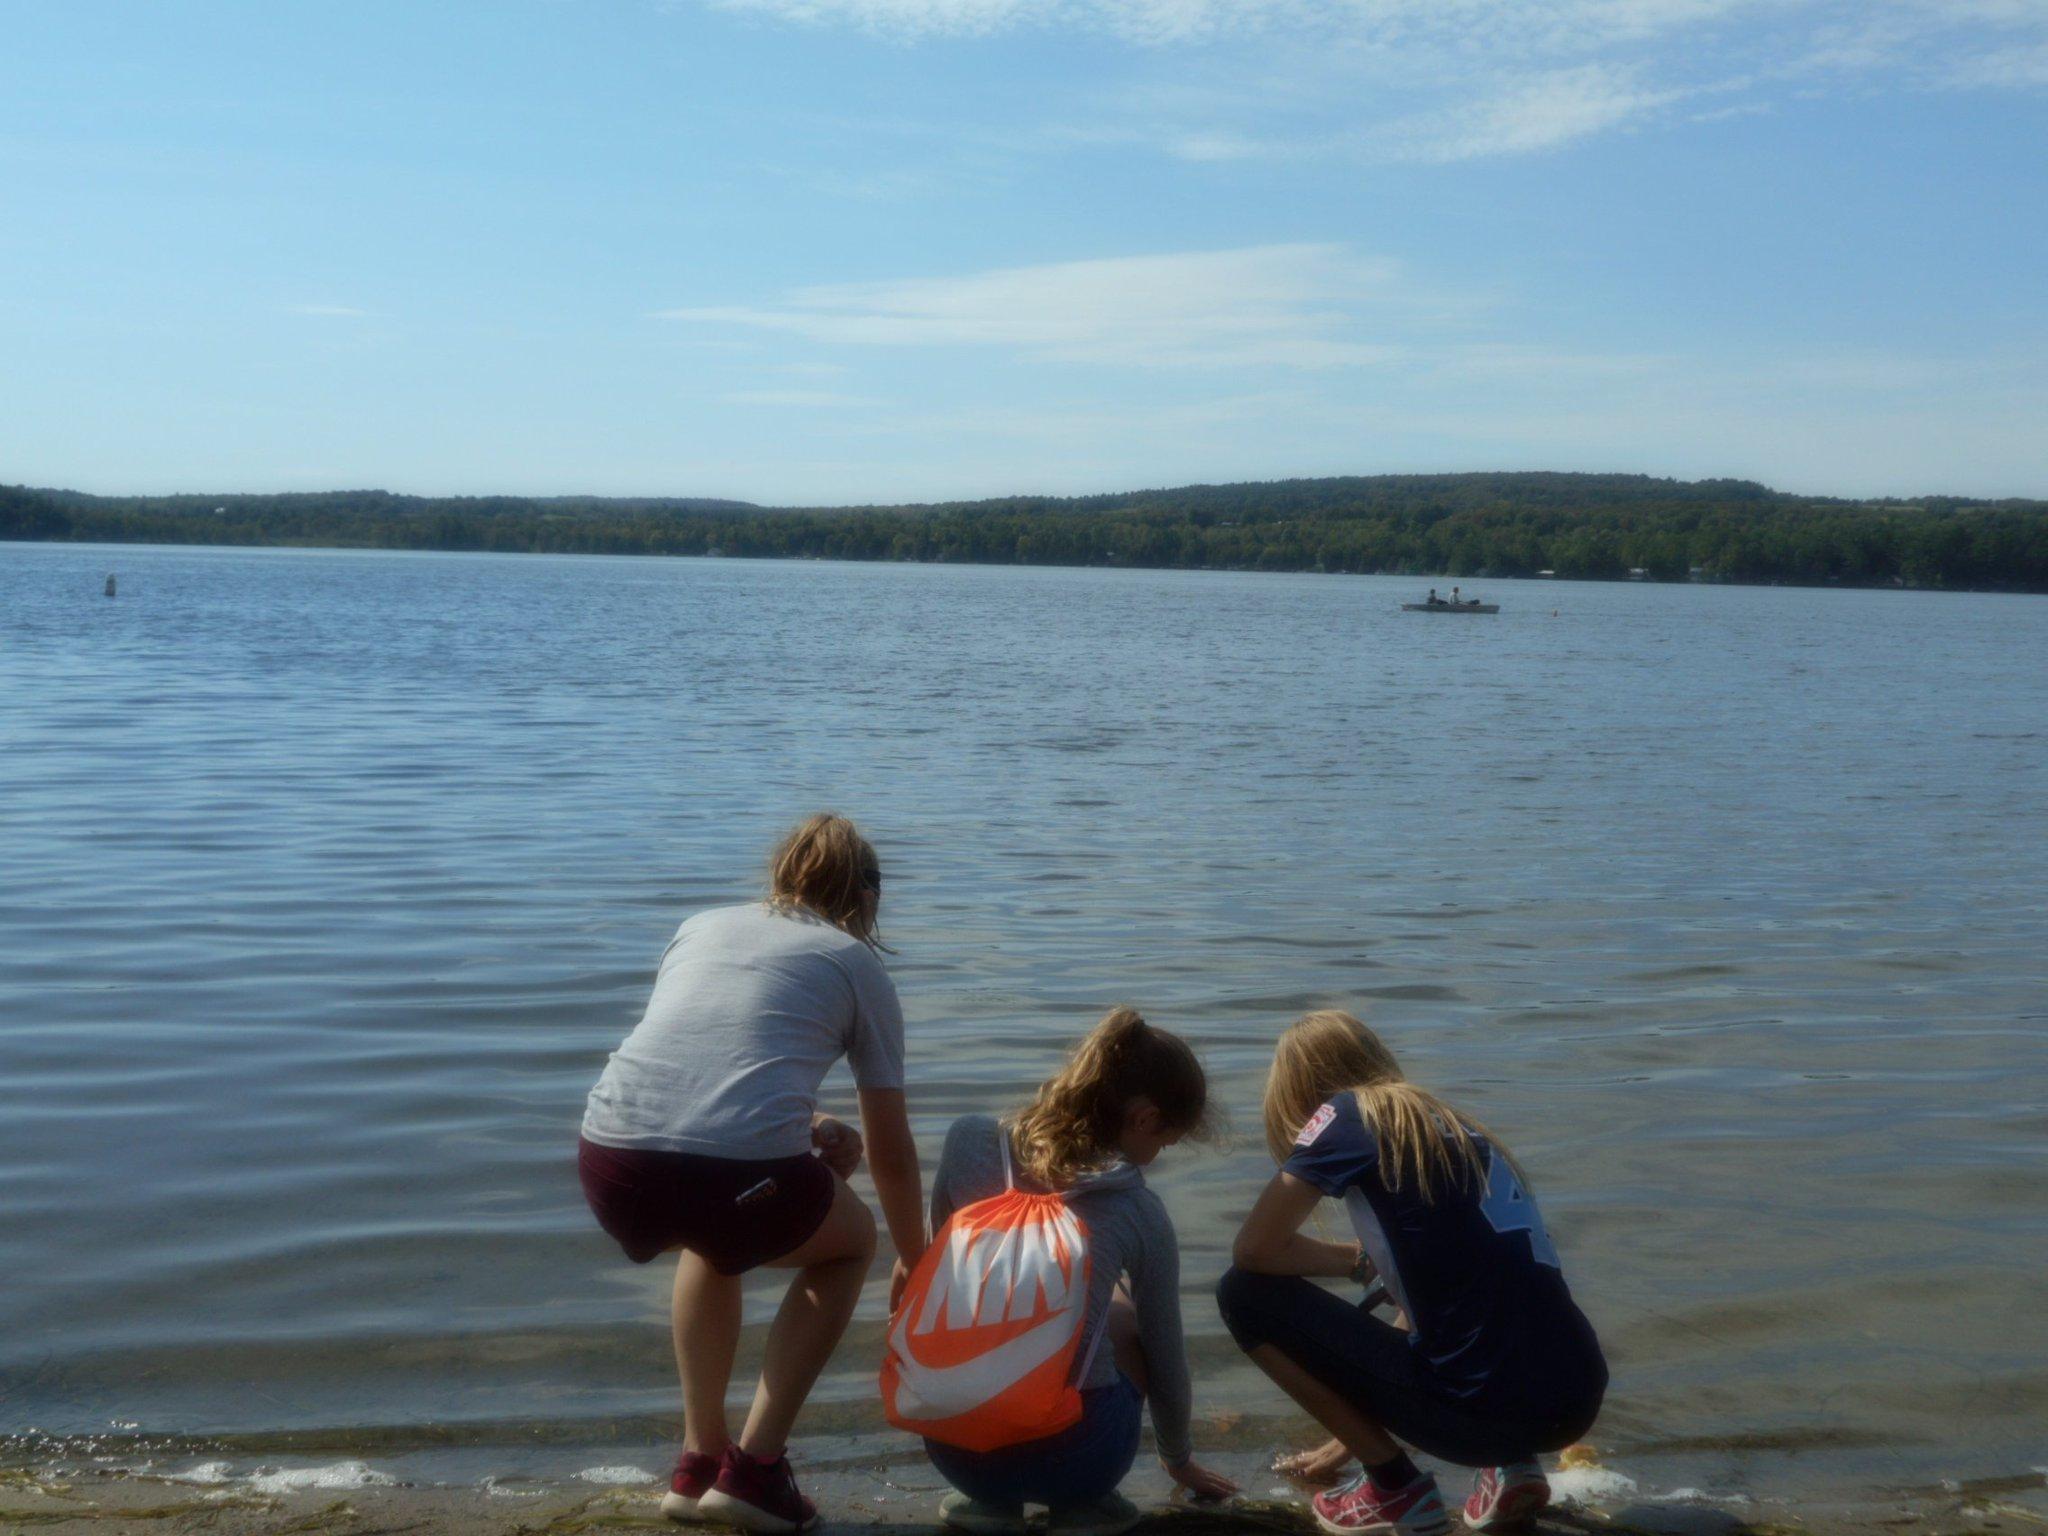 Camping fun at Lake Carmi! @VTStateParks https://t.co/NRB1gz5YA1